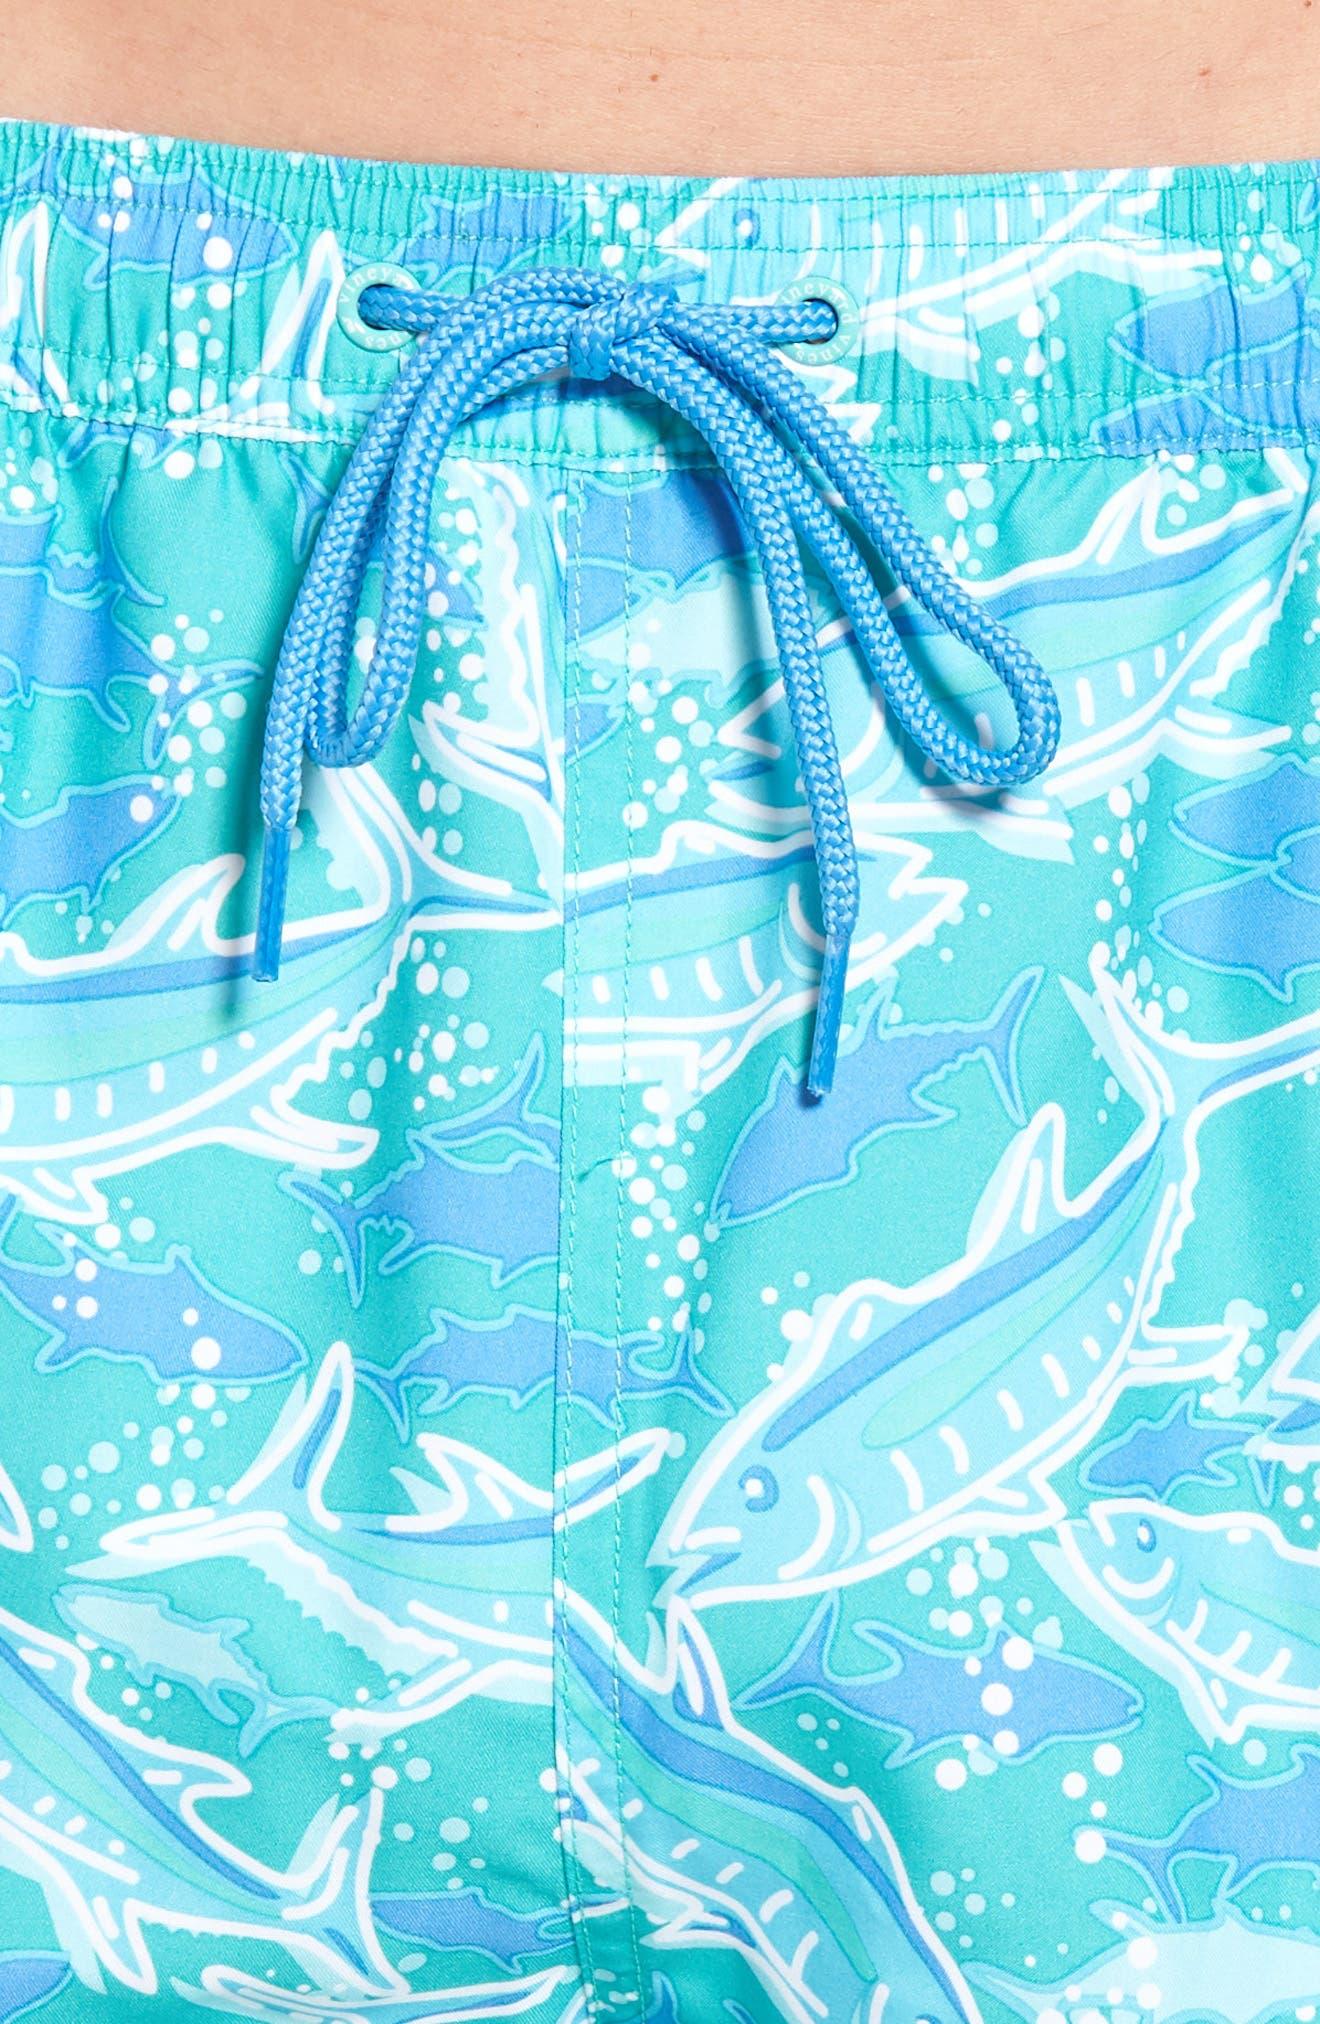 VINEYARD VINES,                             Chappy School of Tuna Swim Trunks,                             Alternate thumbnail 4, color,                             356